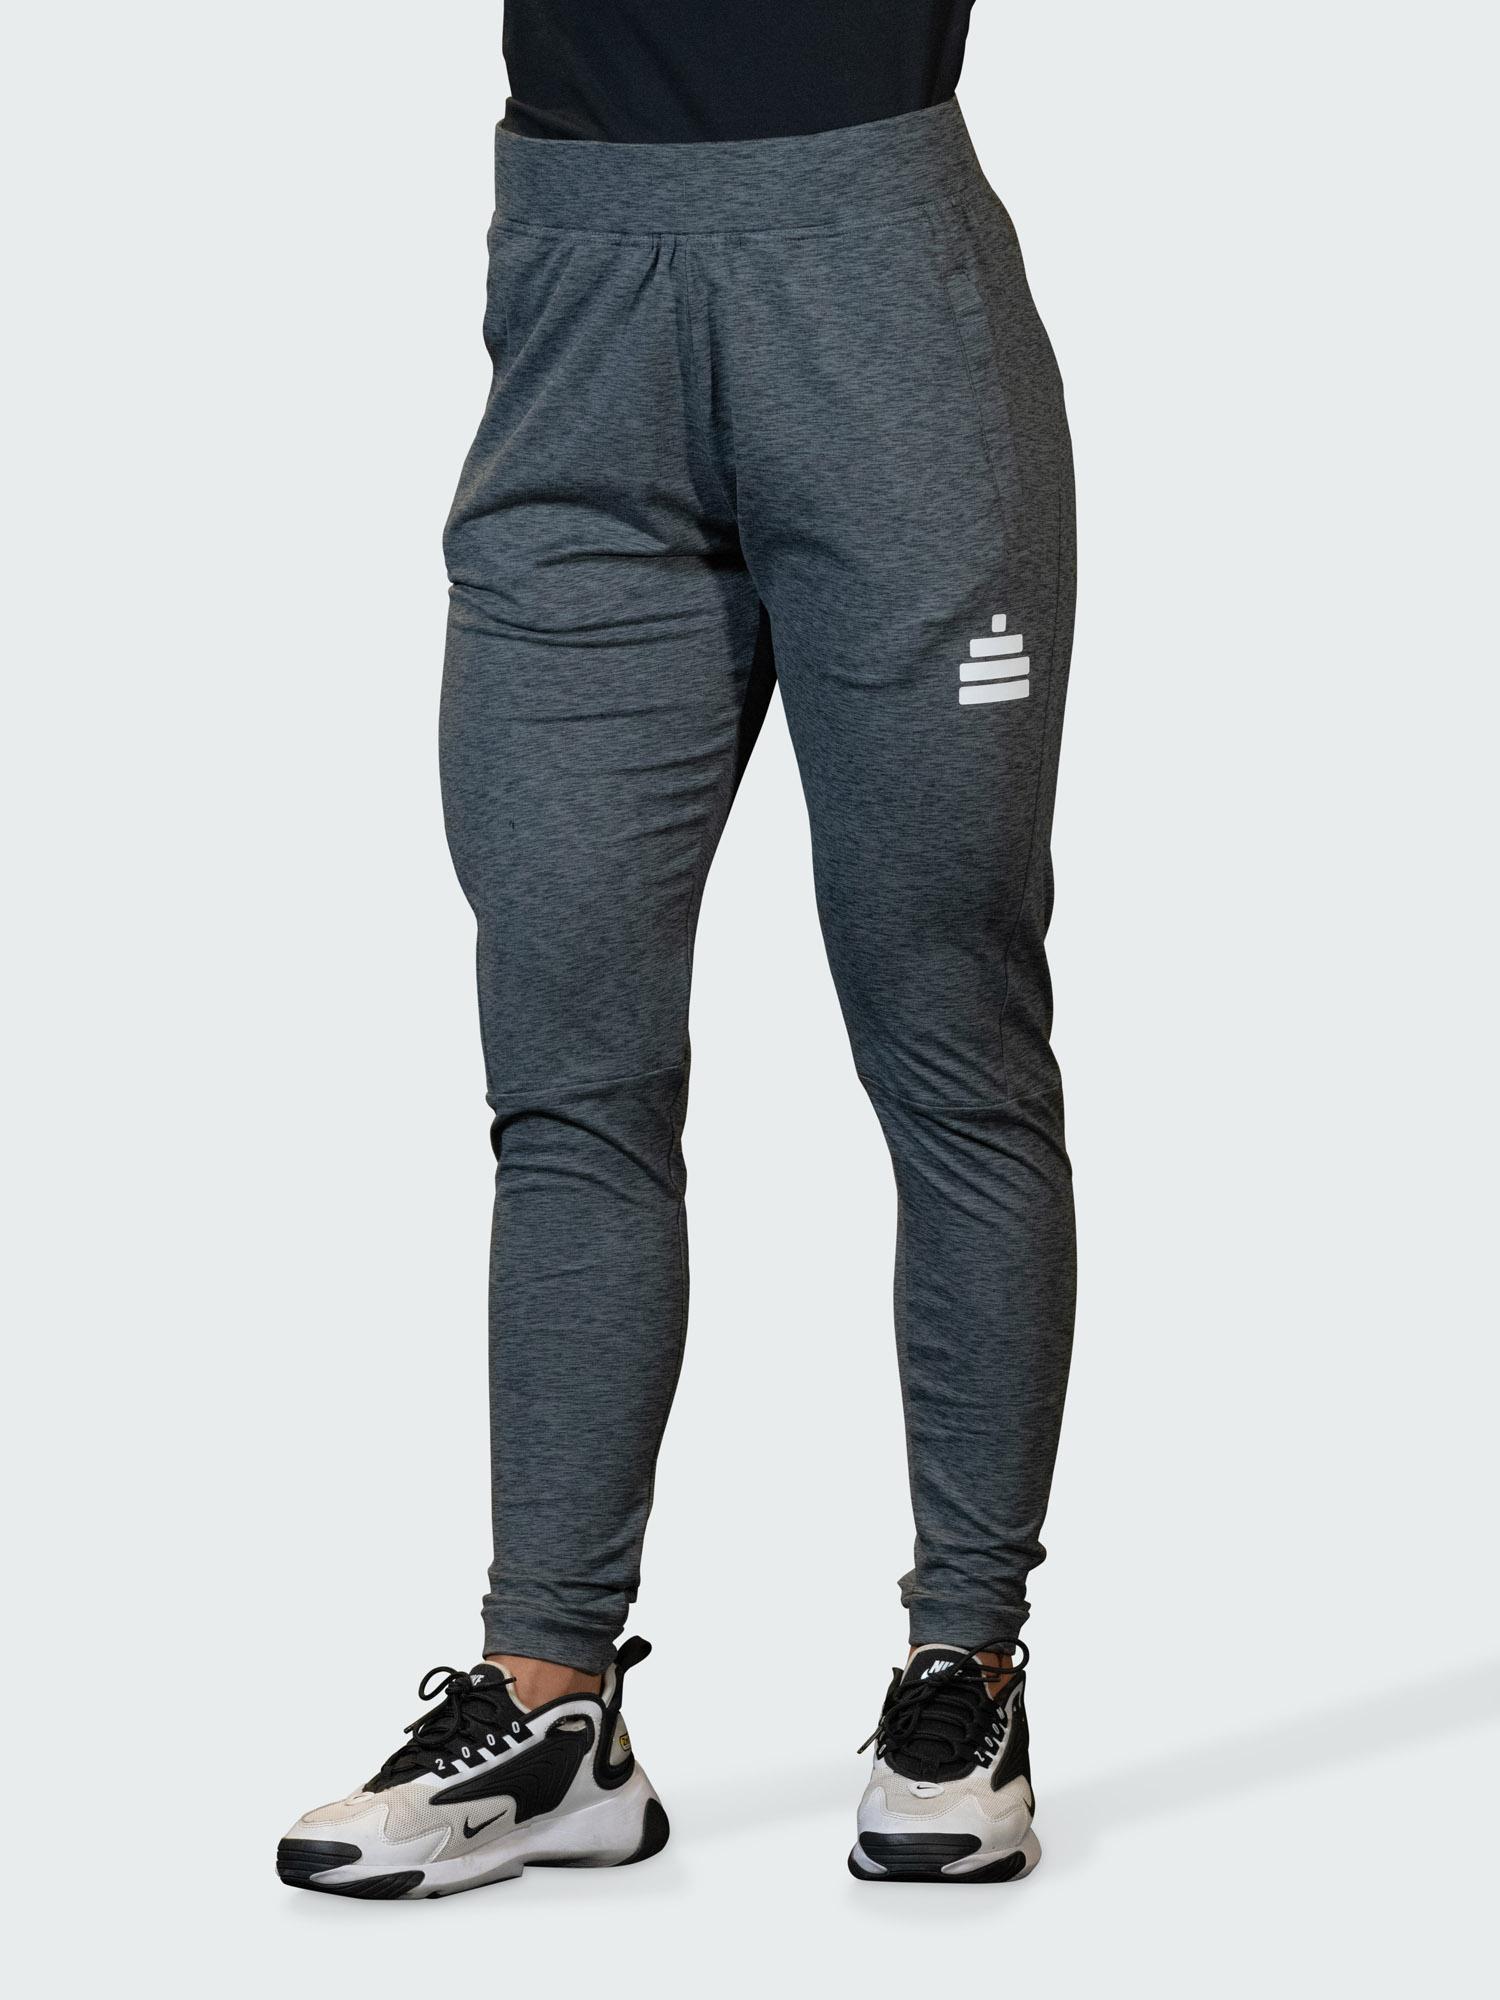 Sweatpants Breeze Womens Gray